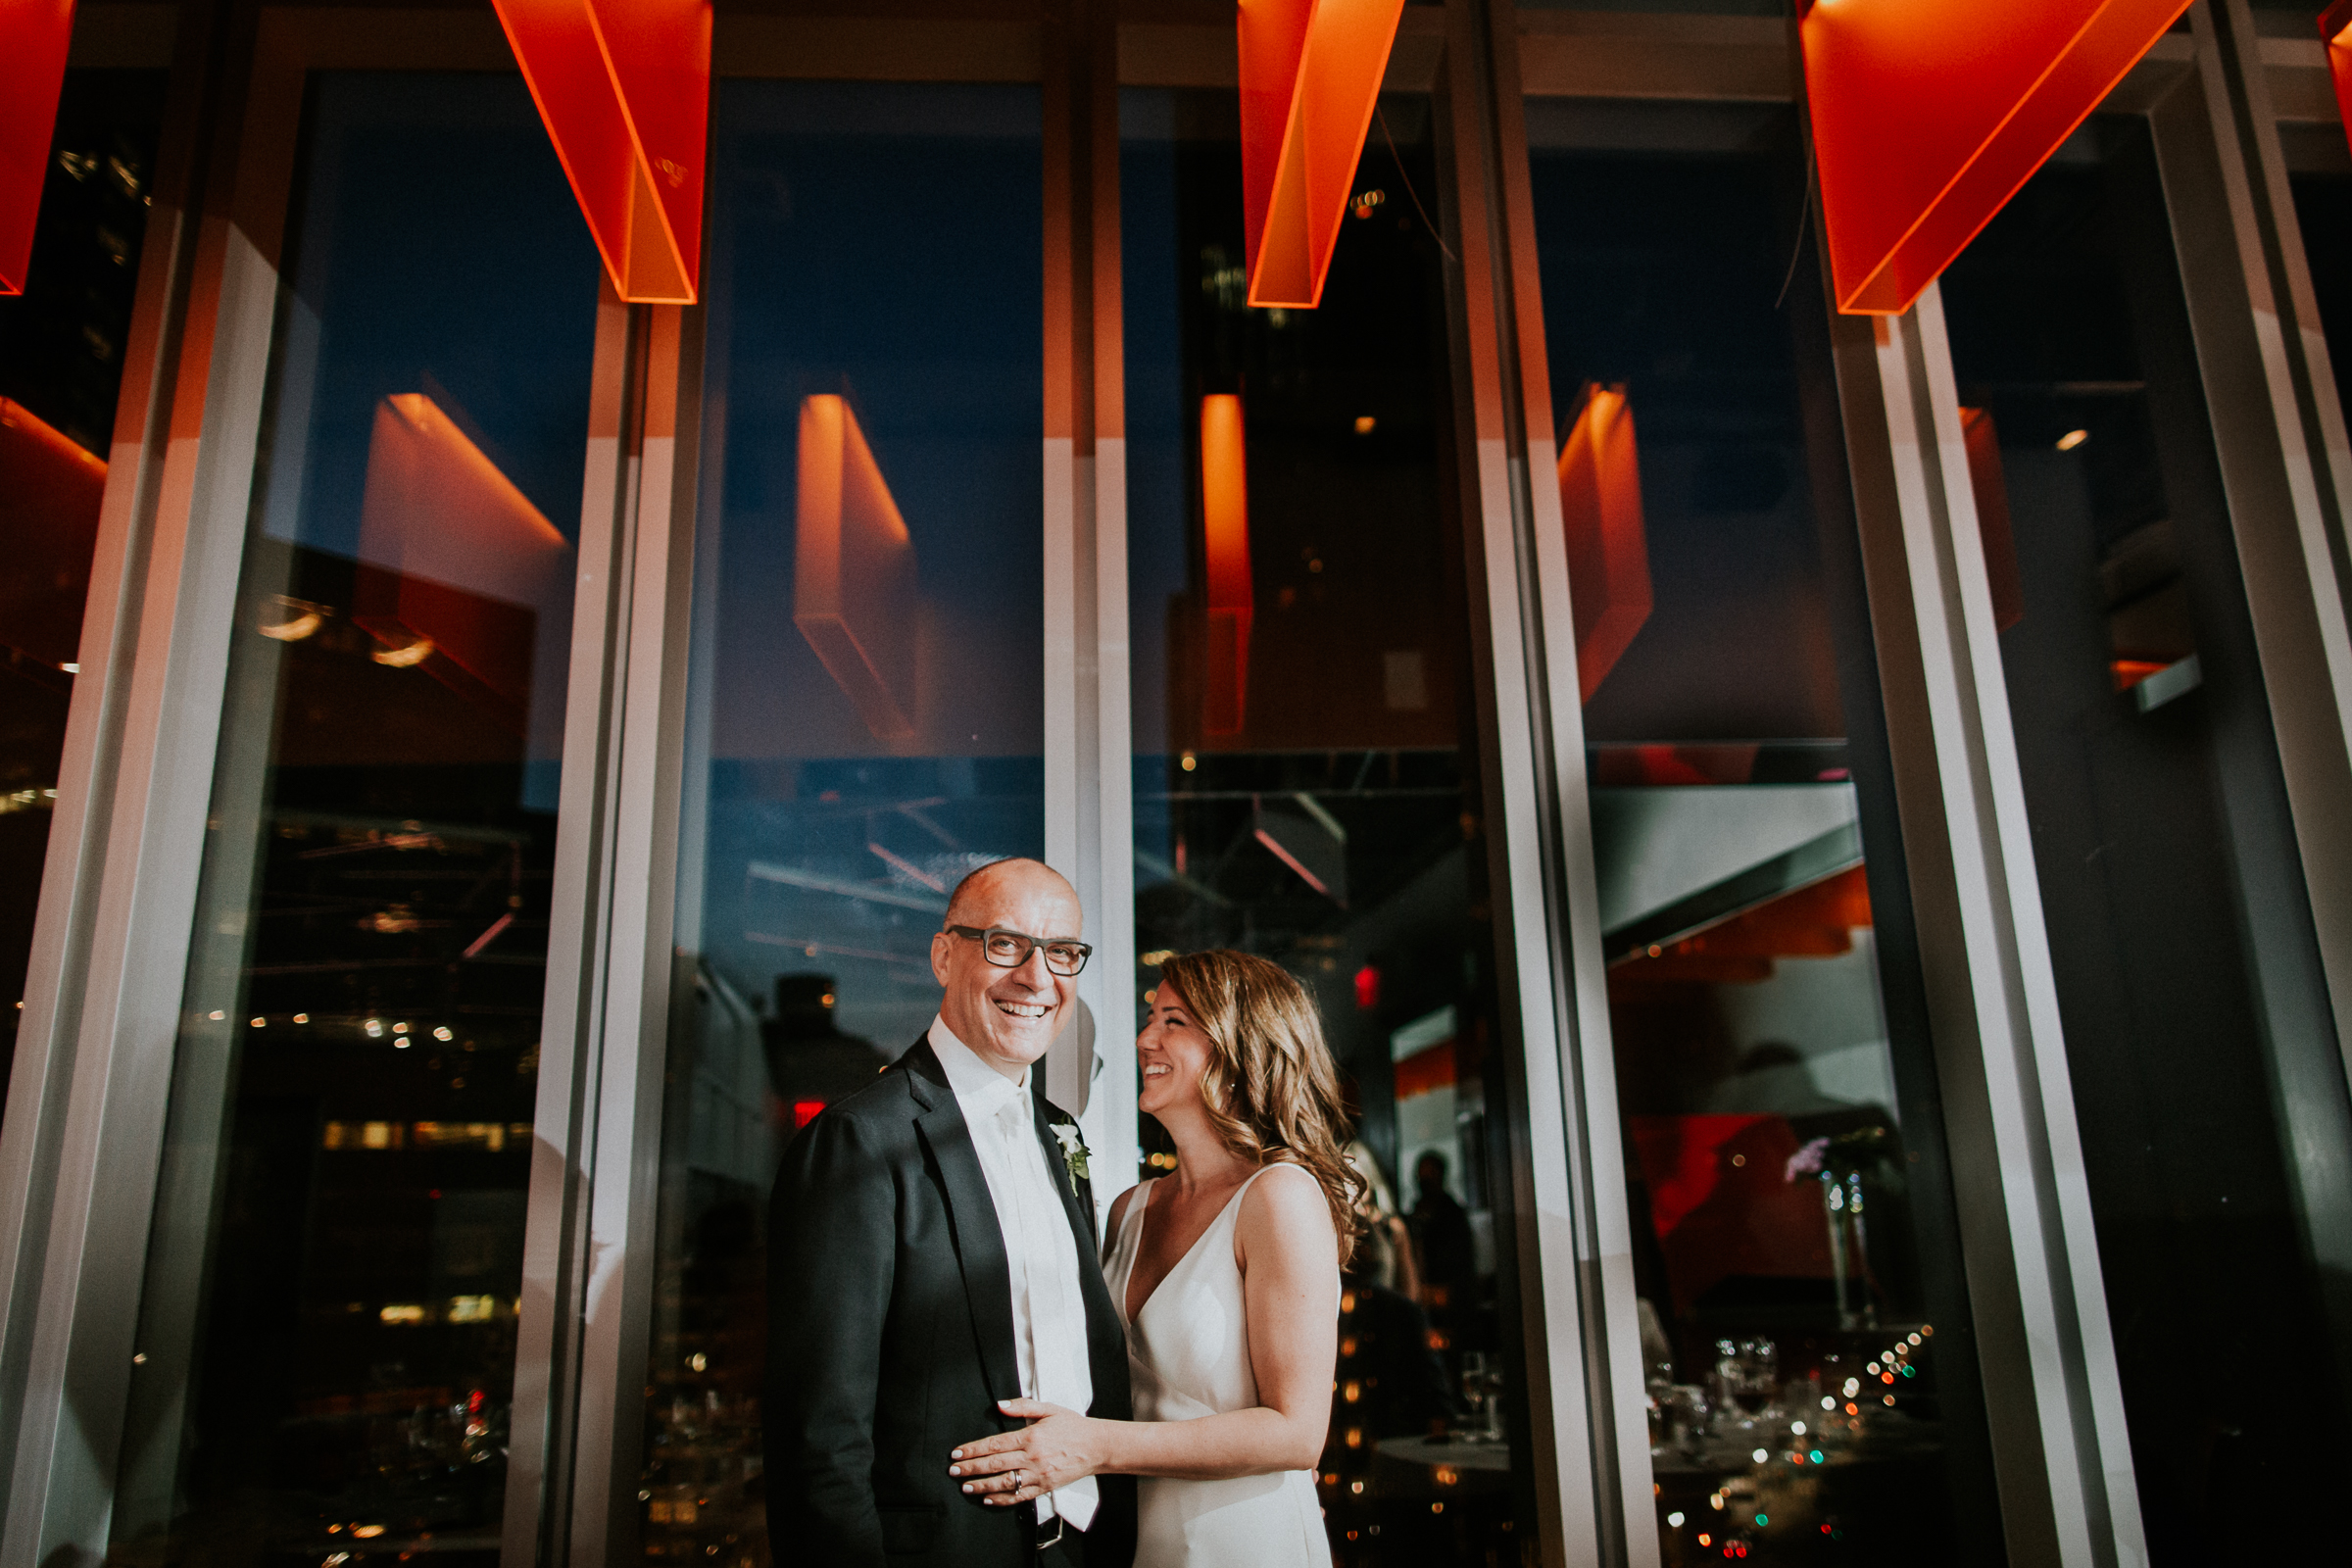 Robert-NYC-Museum-Of-Arts-&-Design-Greek-Italian-New-York-Documentary-Wedding-Photographer-78.jpg